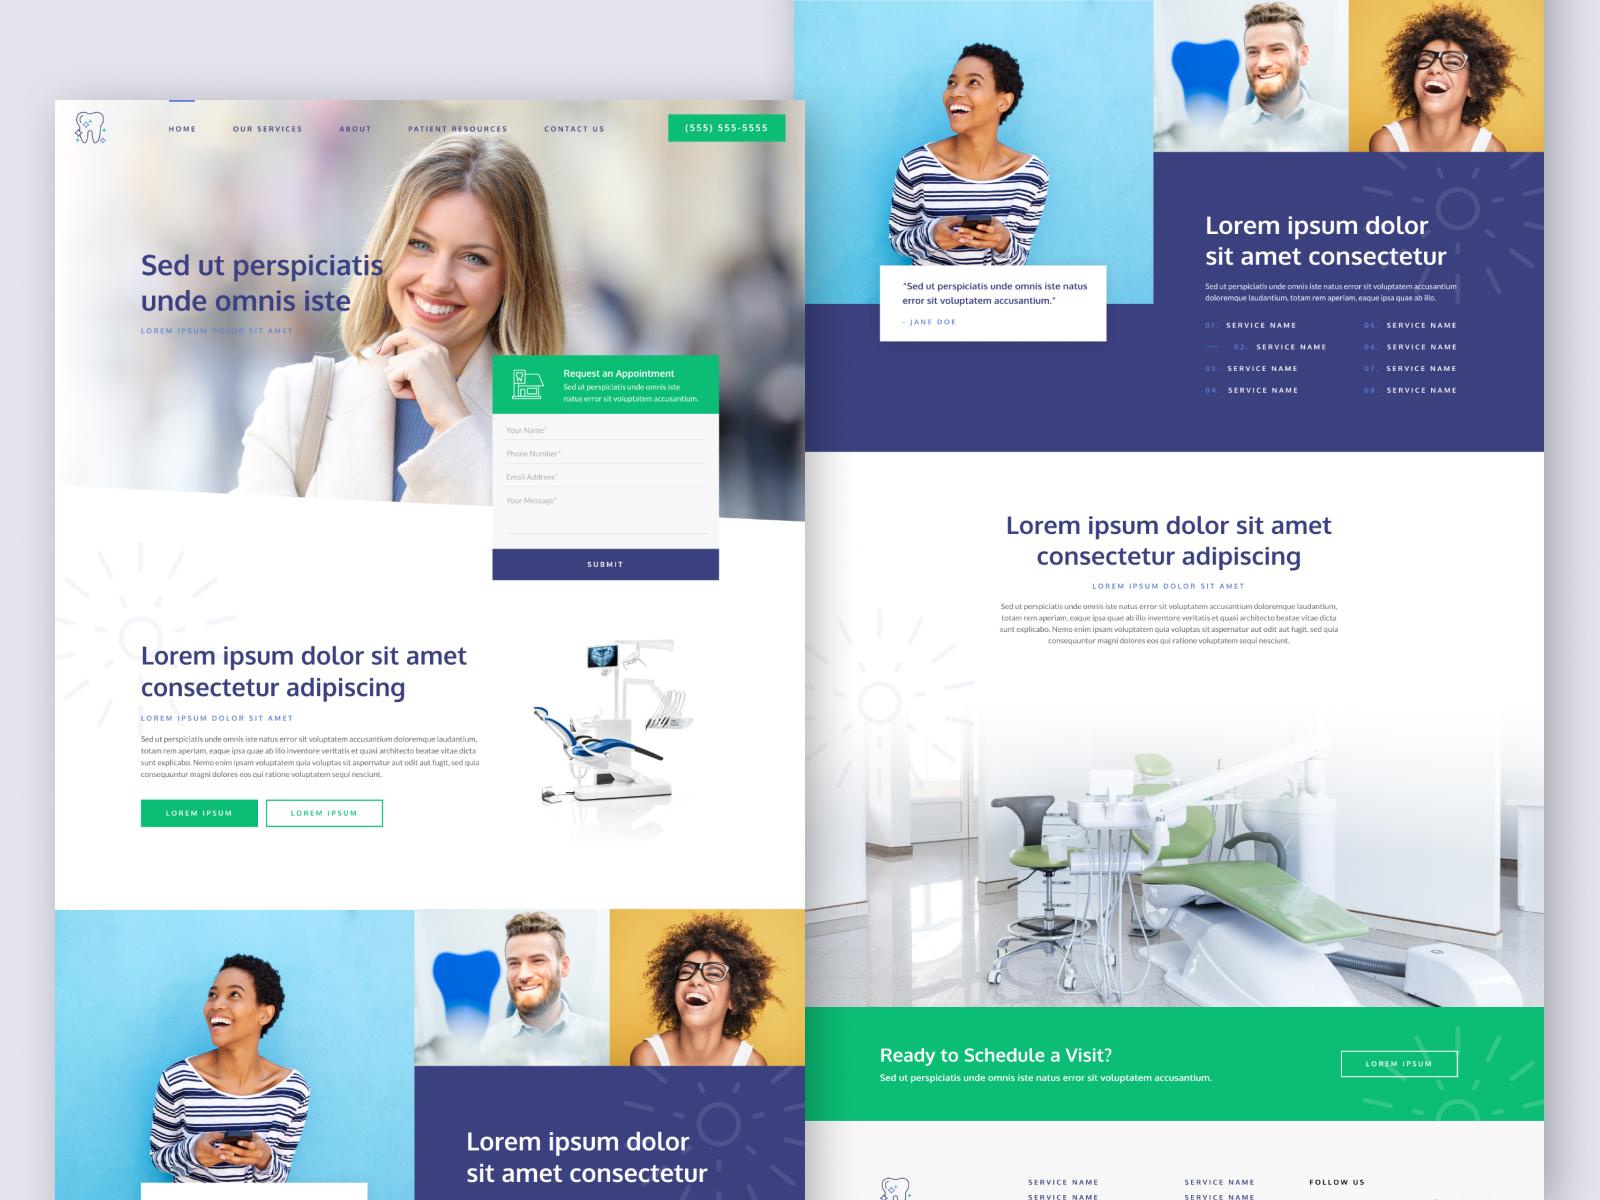 Medical Office Website Design Example #2